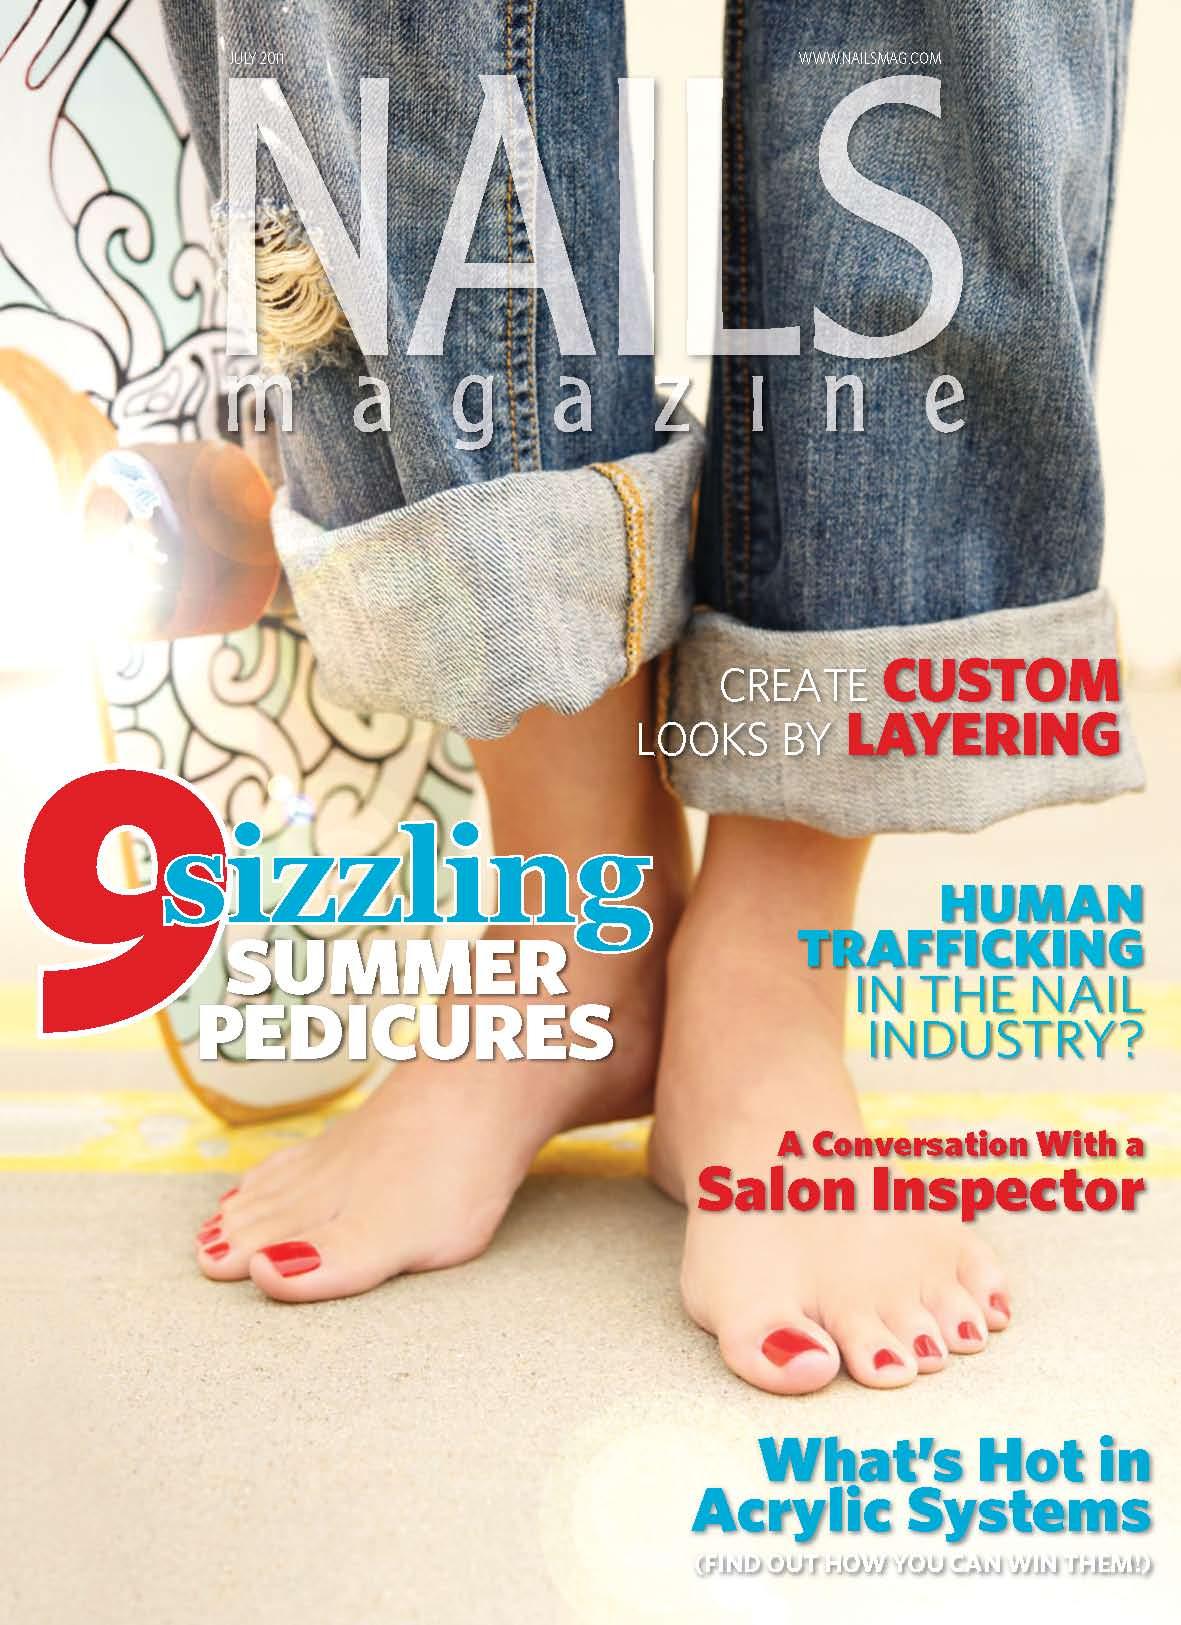 Internet Marketing for Salons - Nails Magazine